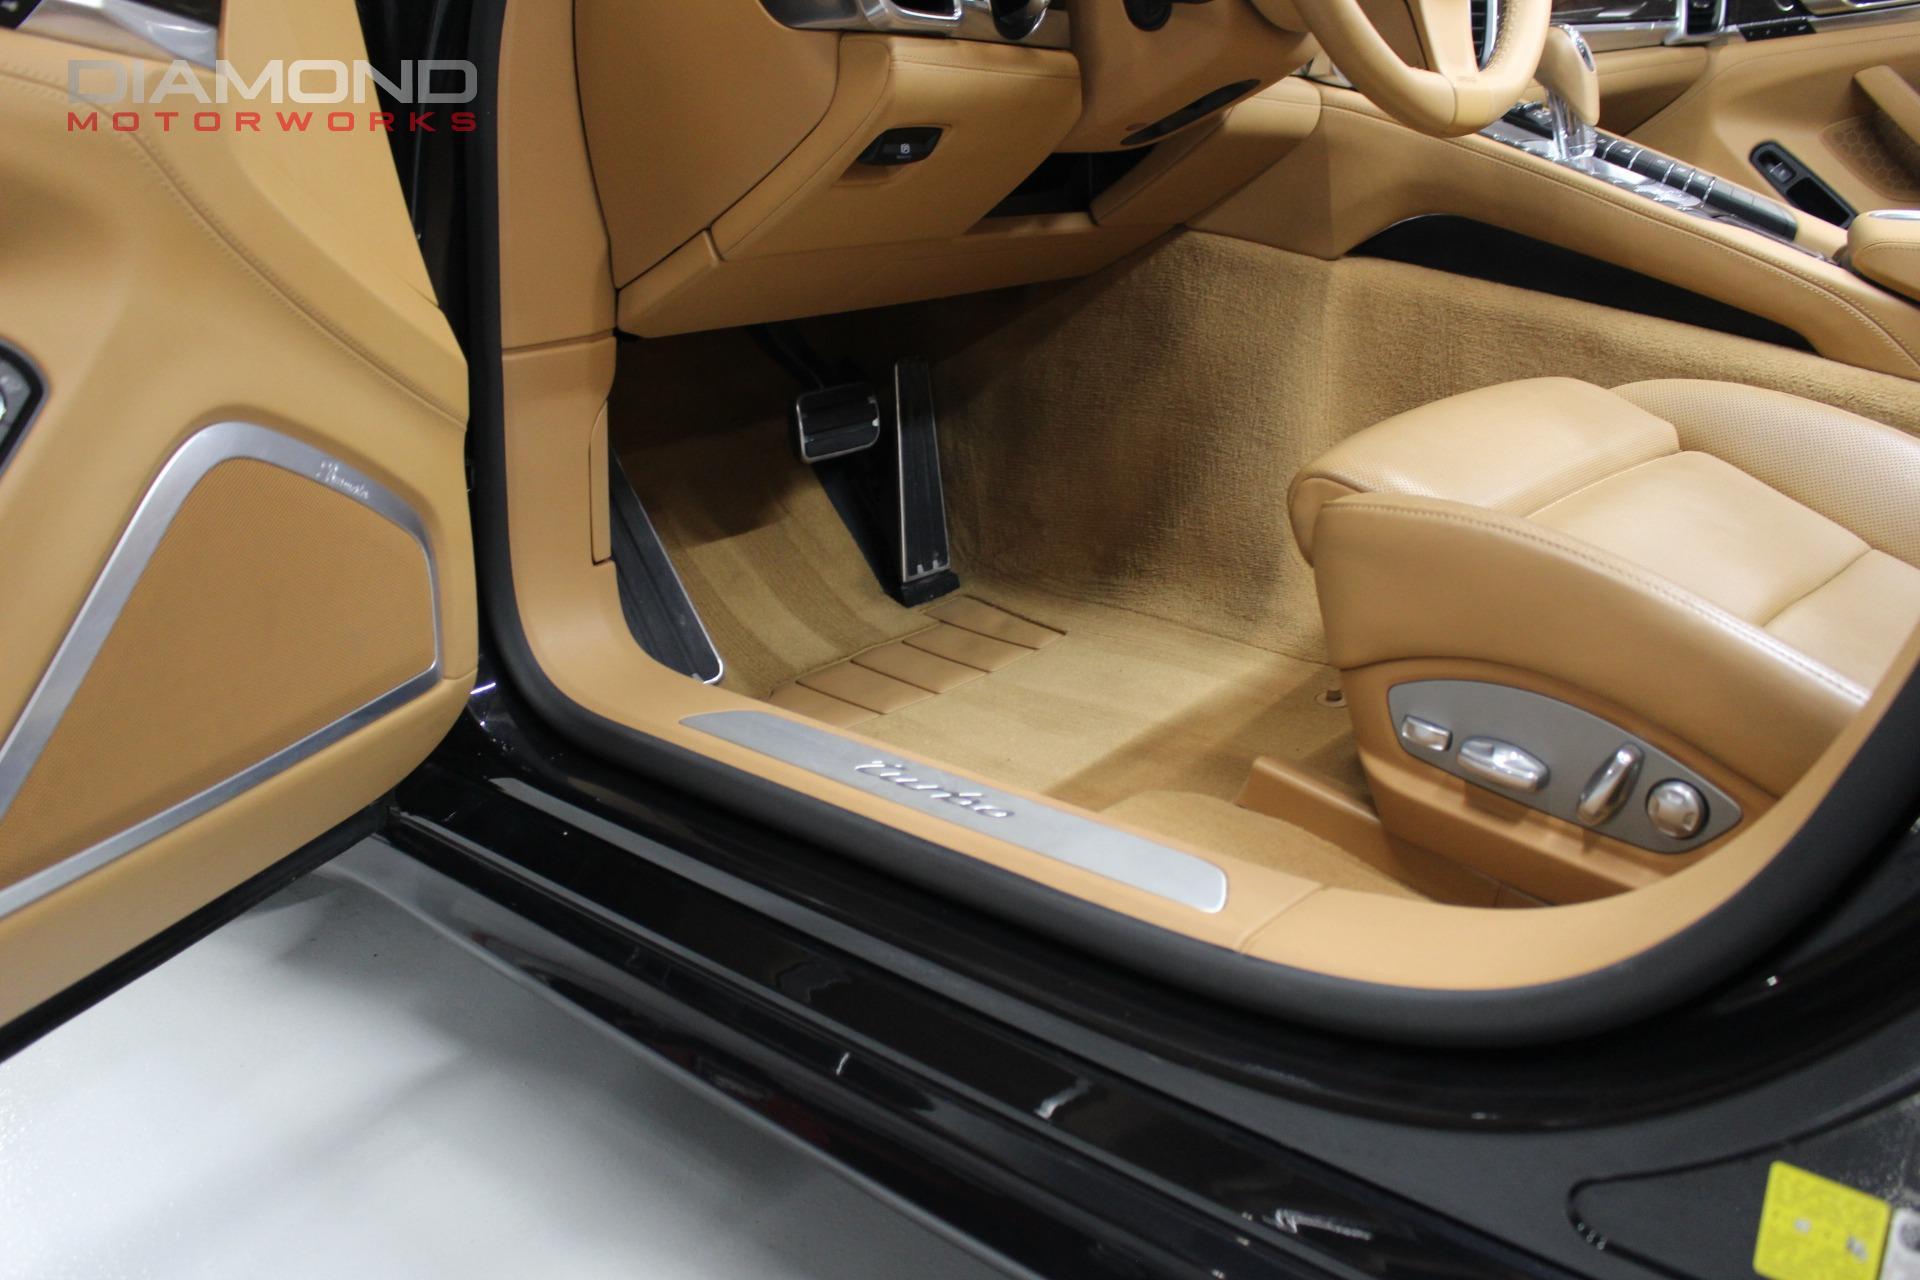 2014 porsche panamera 4dr hatchback turbo executive stock 077348 used 2014 porsche panamera 4dr hatchback turbo executive sciox Gallery